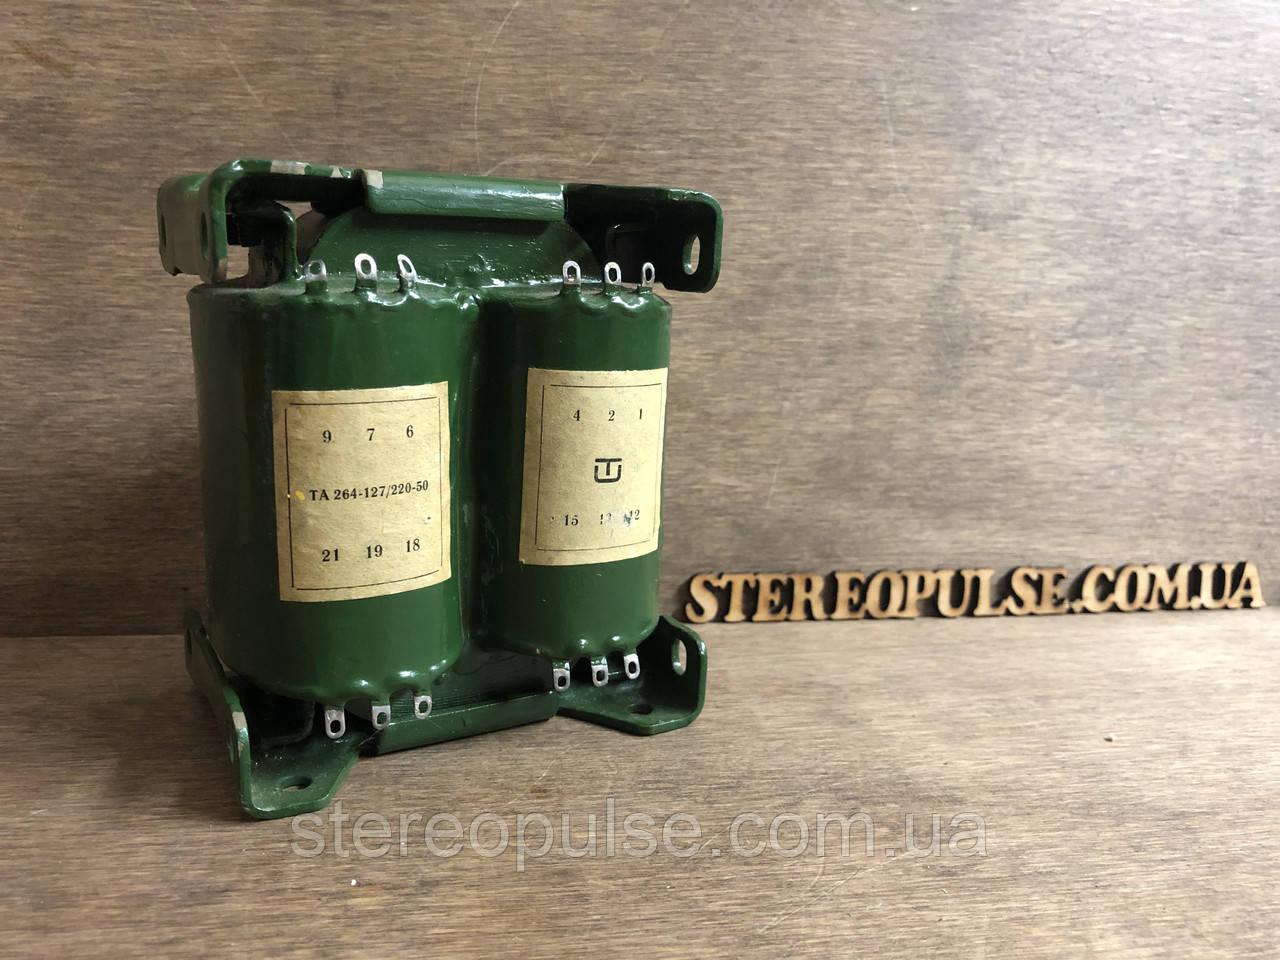 Трансформатор ТА 264-127/220-50 260Вт